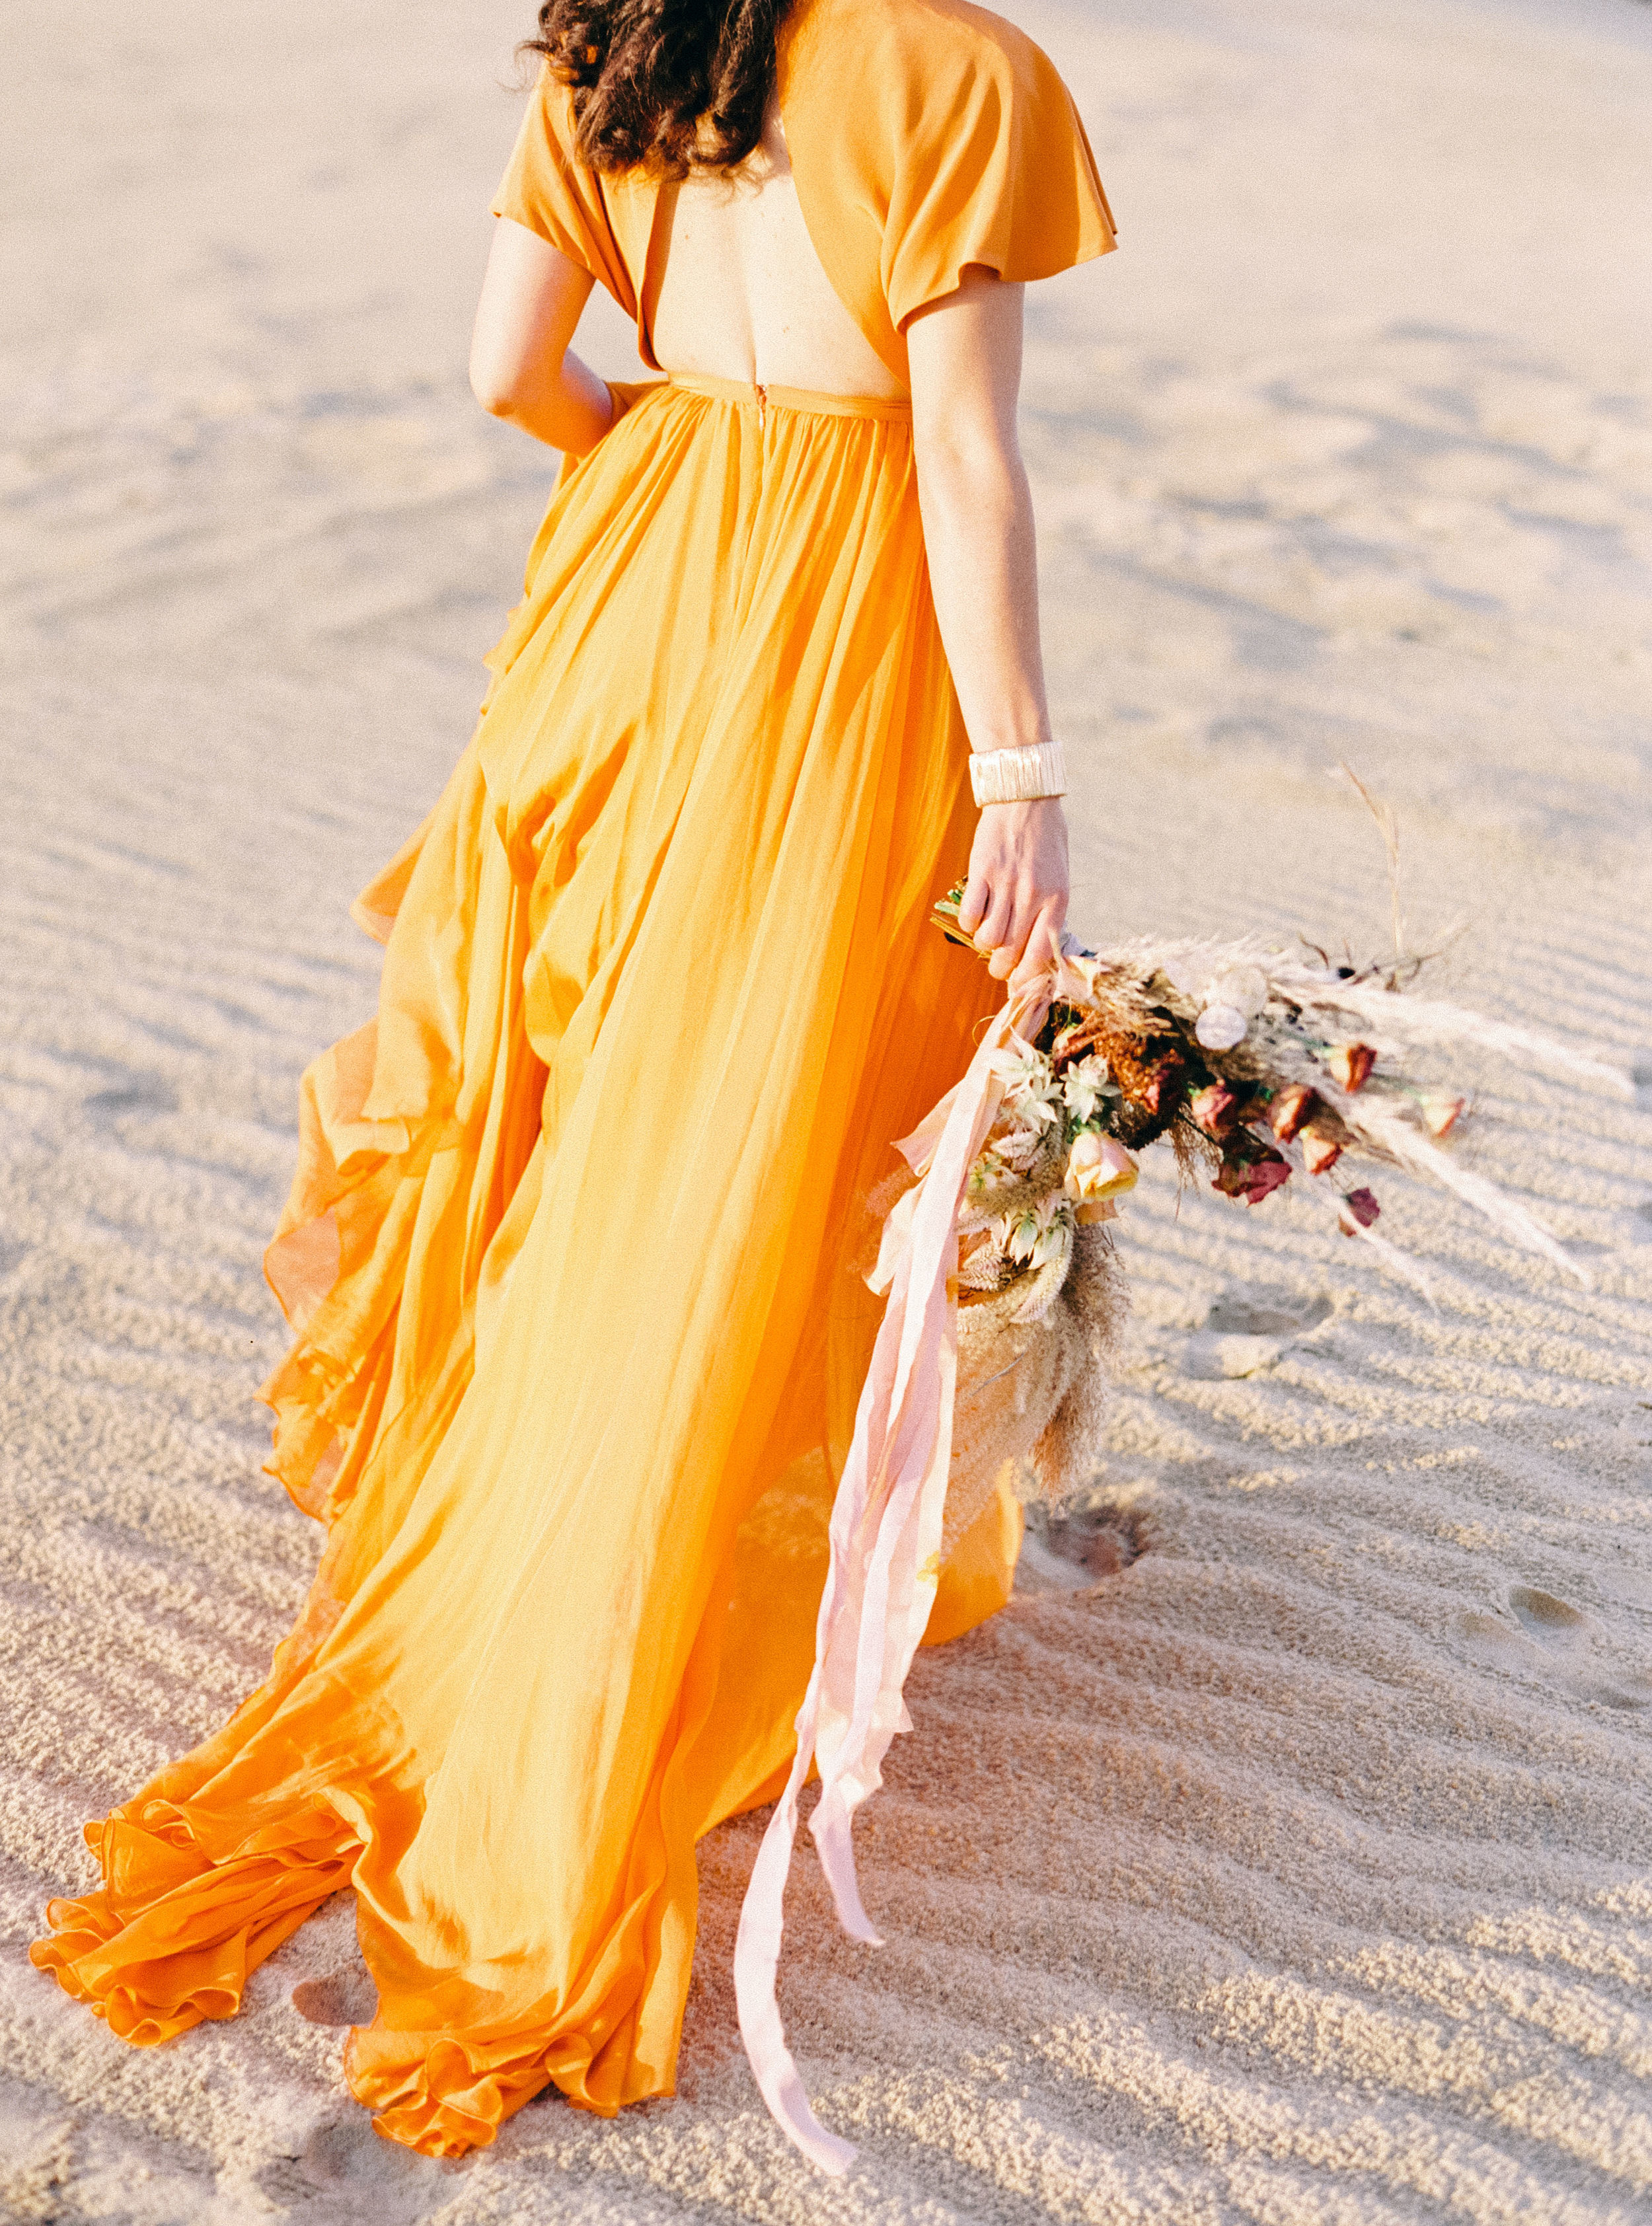 NikkiSanterre_FineArtFilmWeddingPhotographer_WeddingSparrowEditorial_AisleSociety_DesertEngagementSession-8.jpg